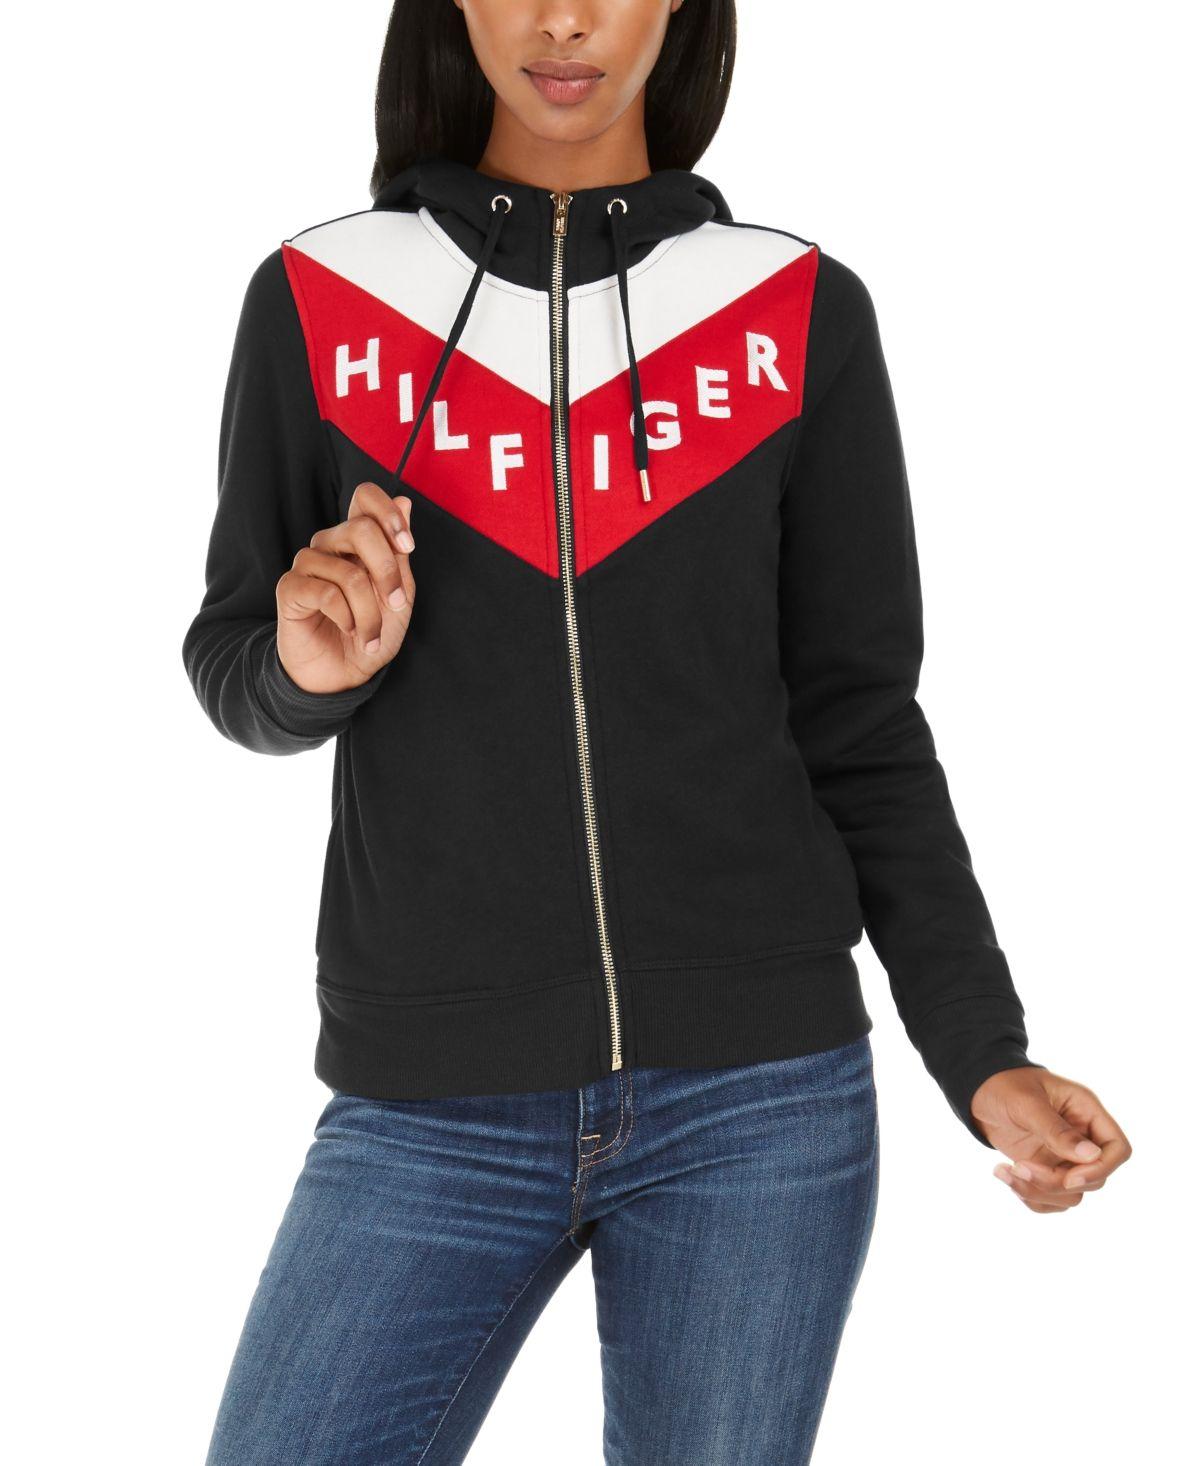 Tommy Hilfiger Sport Colorblocked Zip Hoodie Black Womens Clothing Tops Hoodies Womens Big Clothes